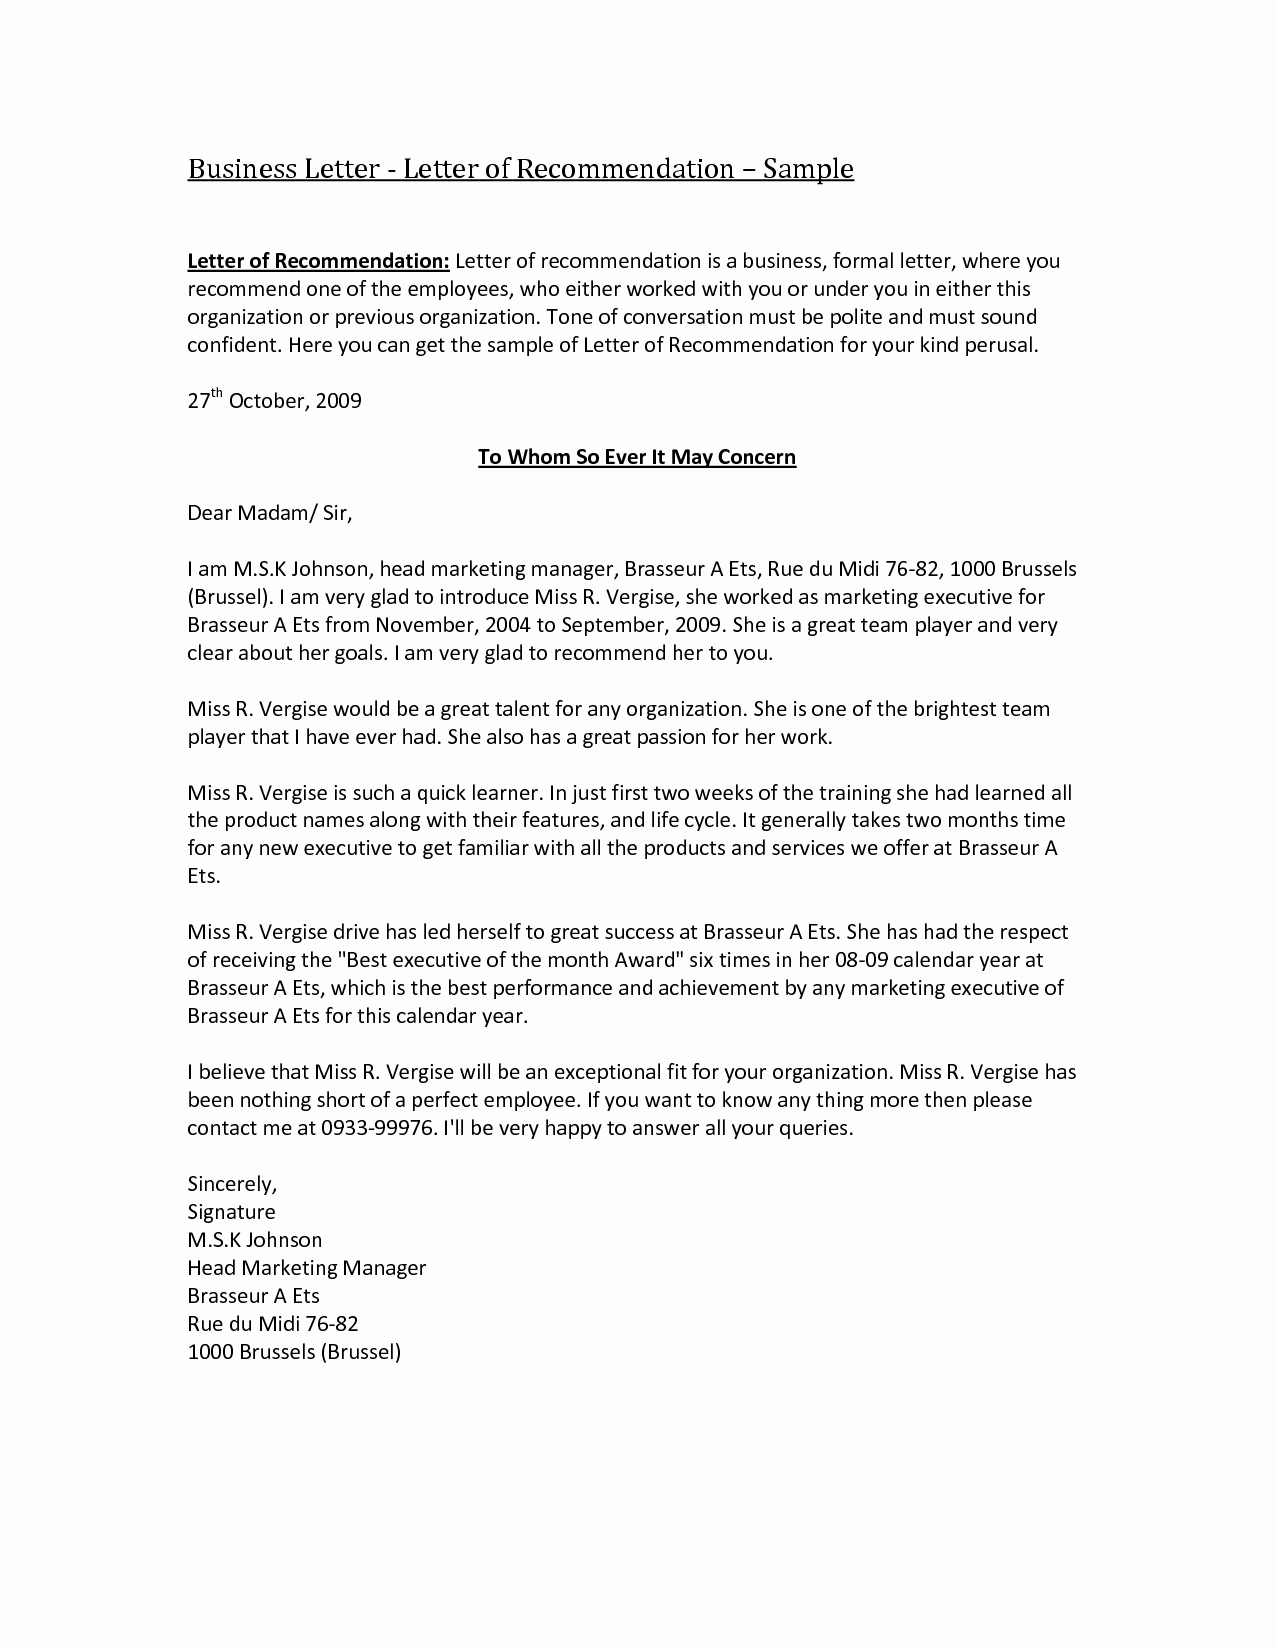 Formal Letter Of Recommendation Template Elegant Best S Of Business Reference Letter Samples